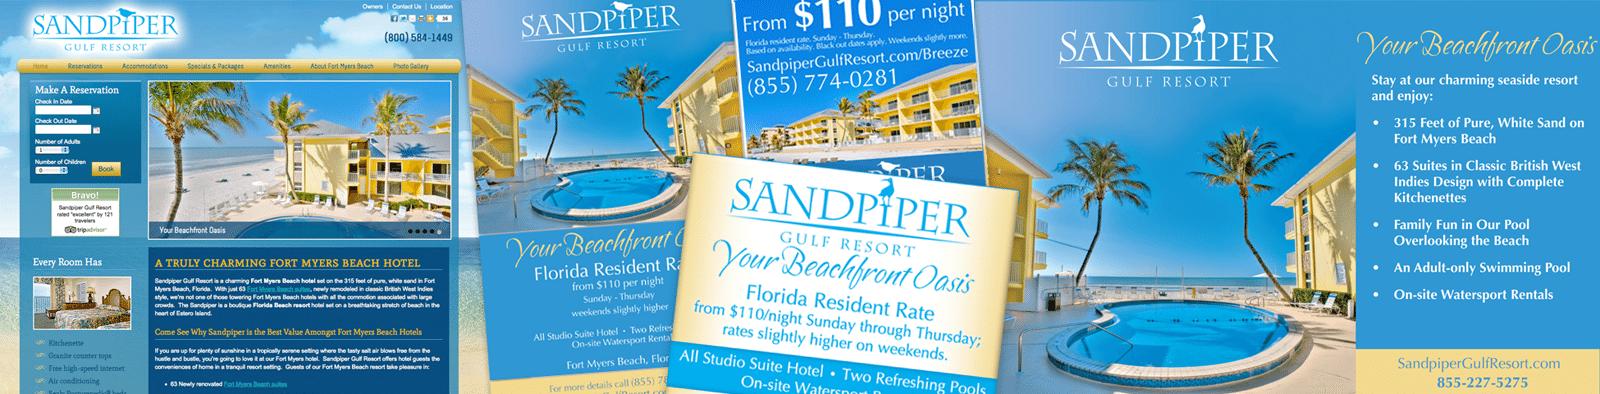 Hotel Marketing Agency - Hotel Marketing Campaign Creative for SandPiper Gulf Resort